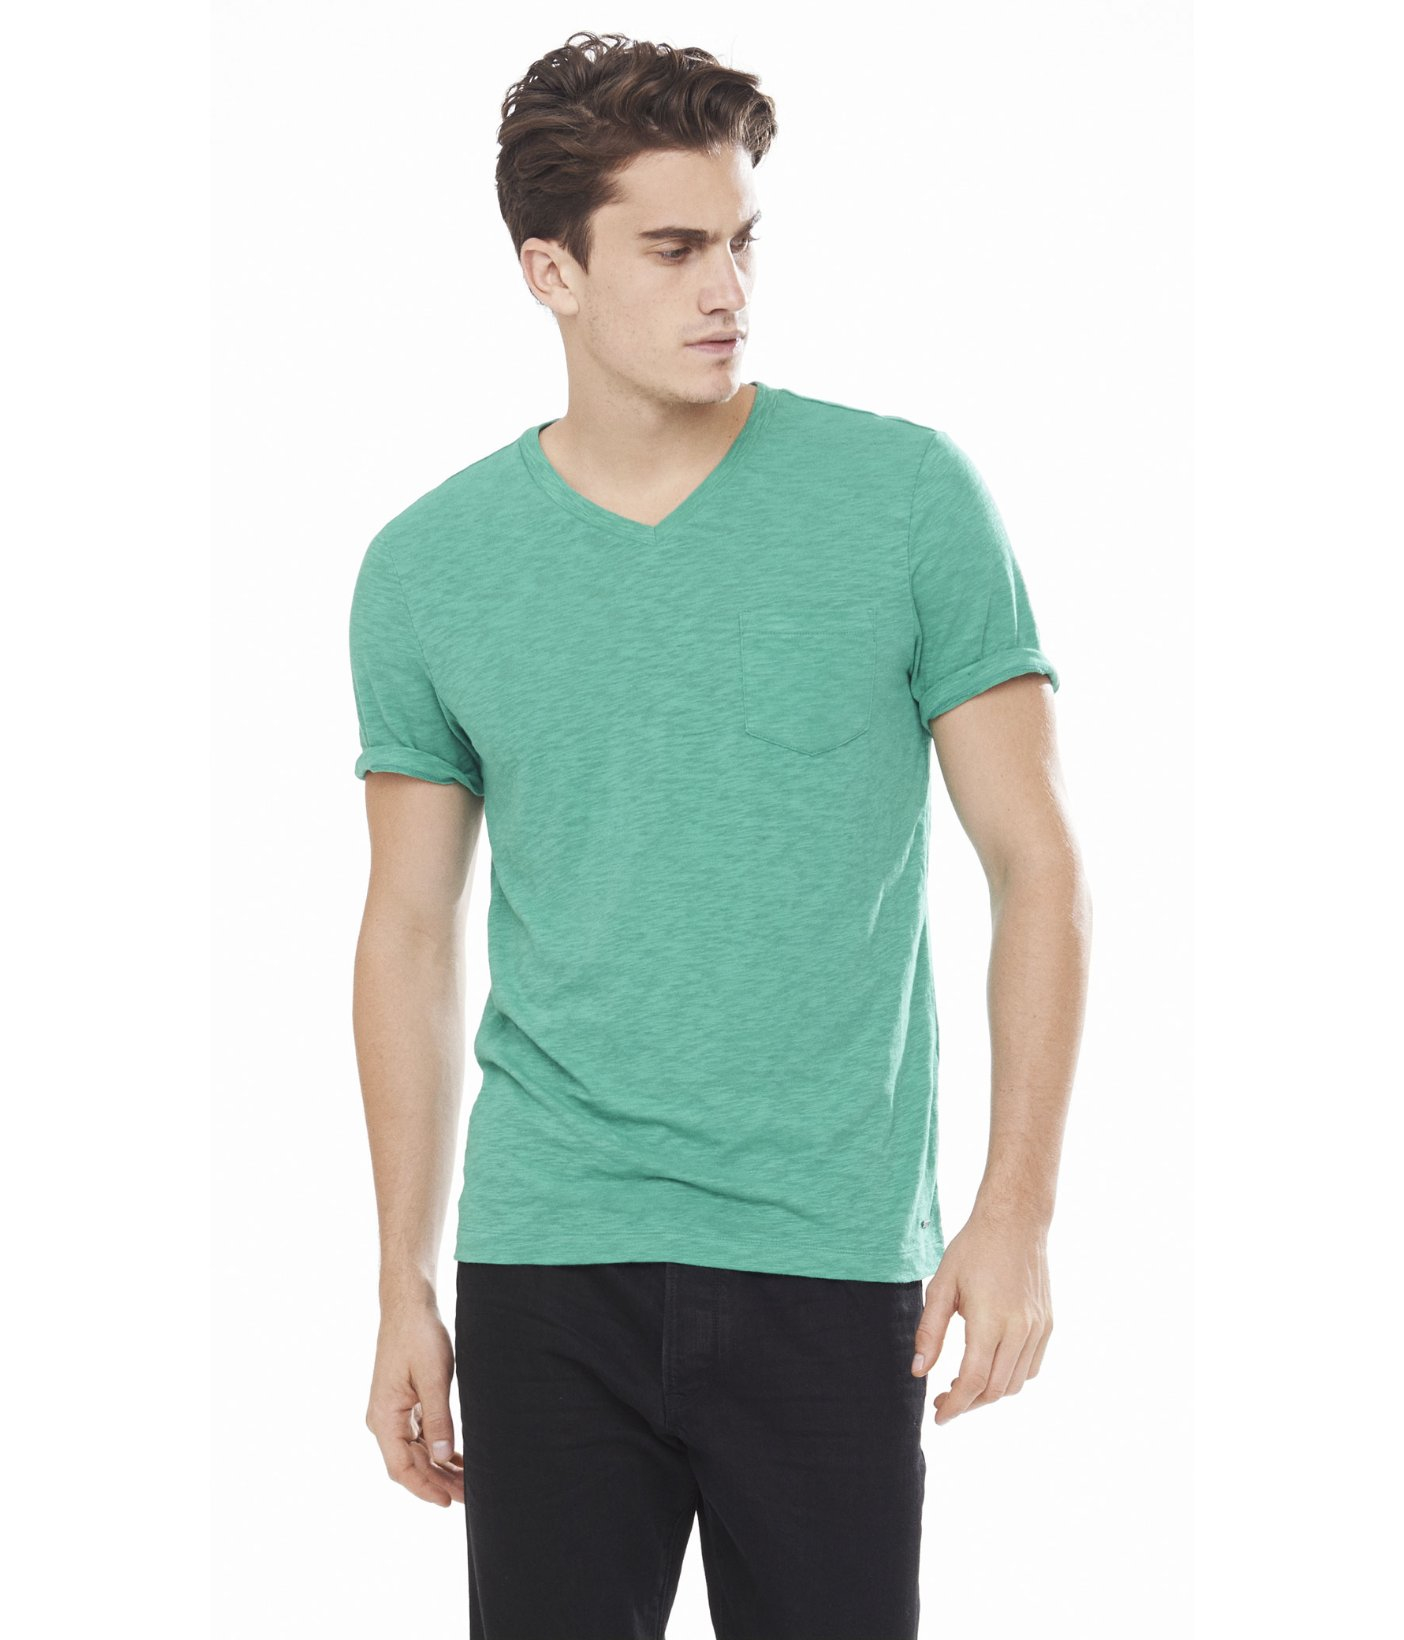 Express twisted slub v neck pocket tee in green for men for Men s v neck pocket tee shirts